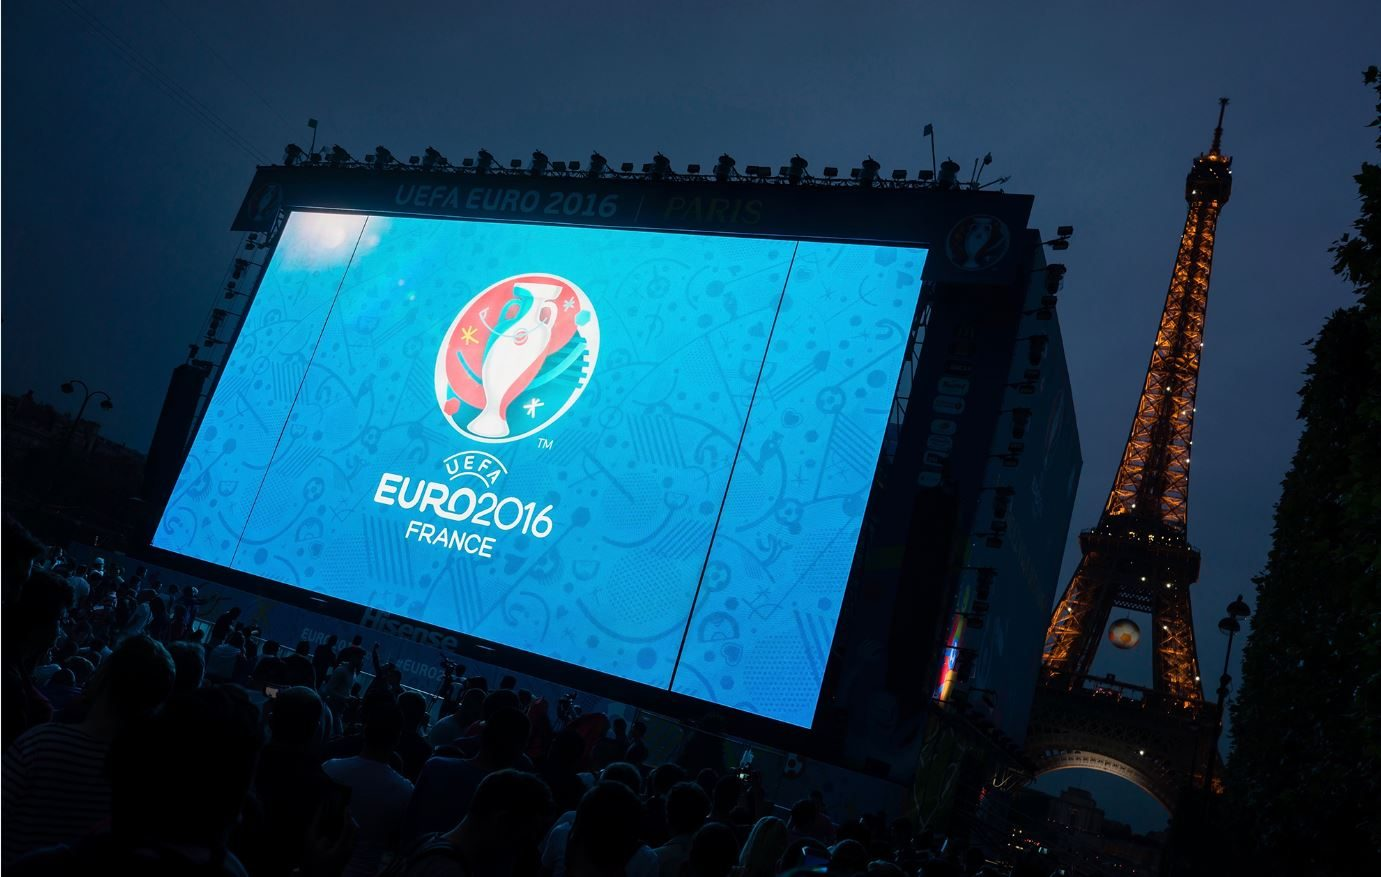 Giant Modular Led Screen Supervision Fan Zone Tour Eiffel